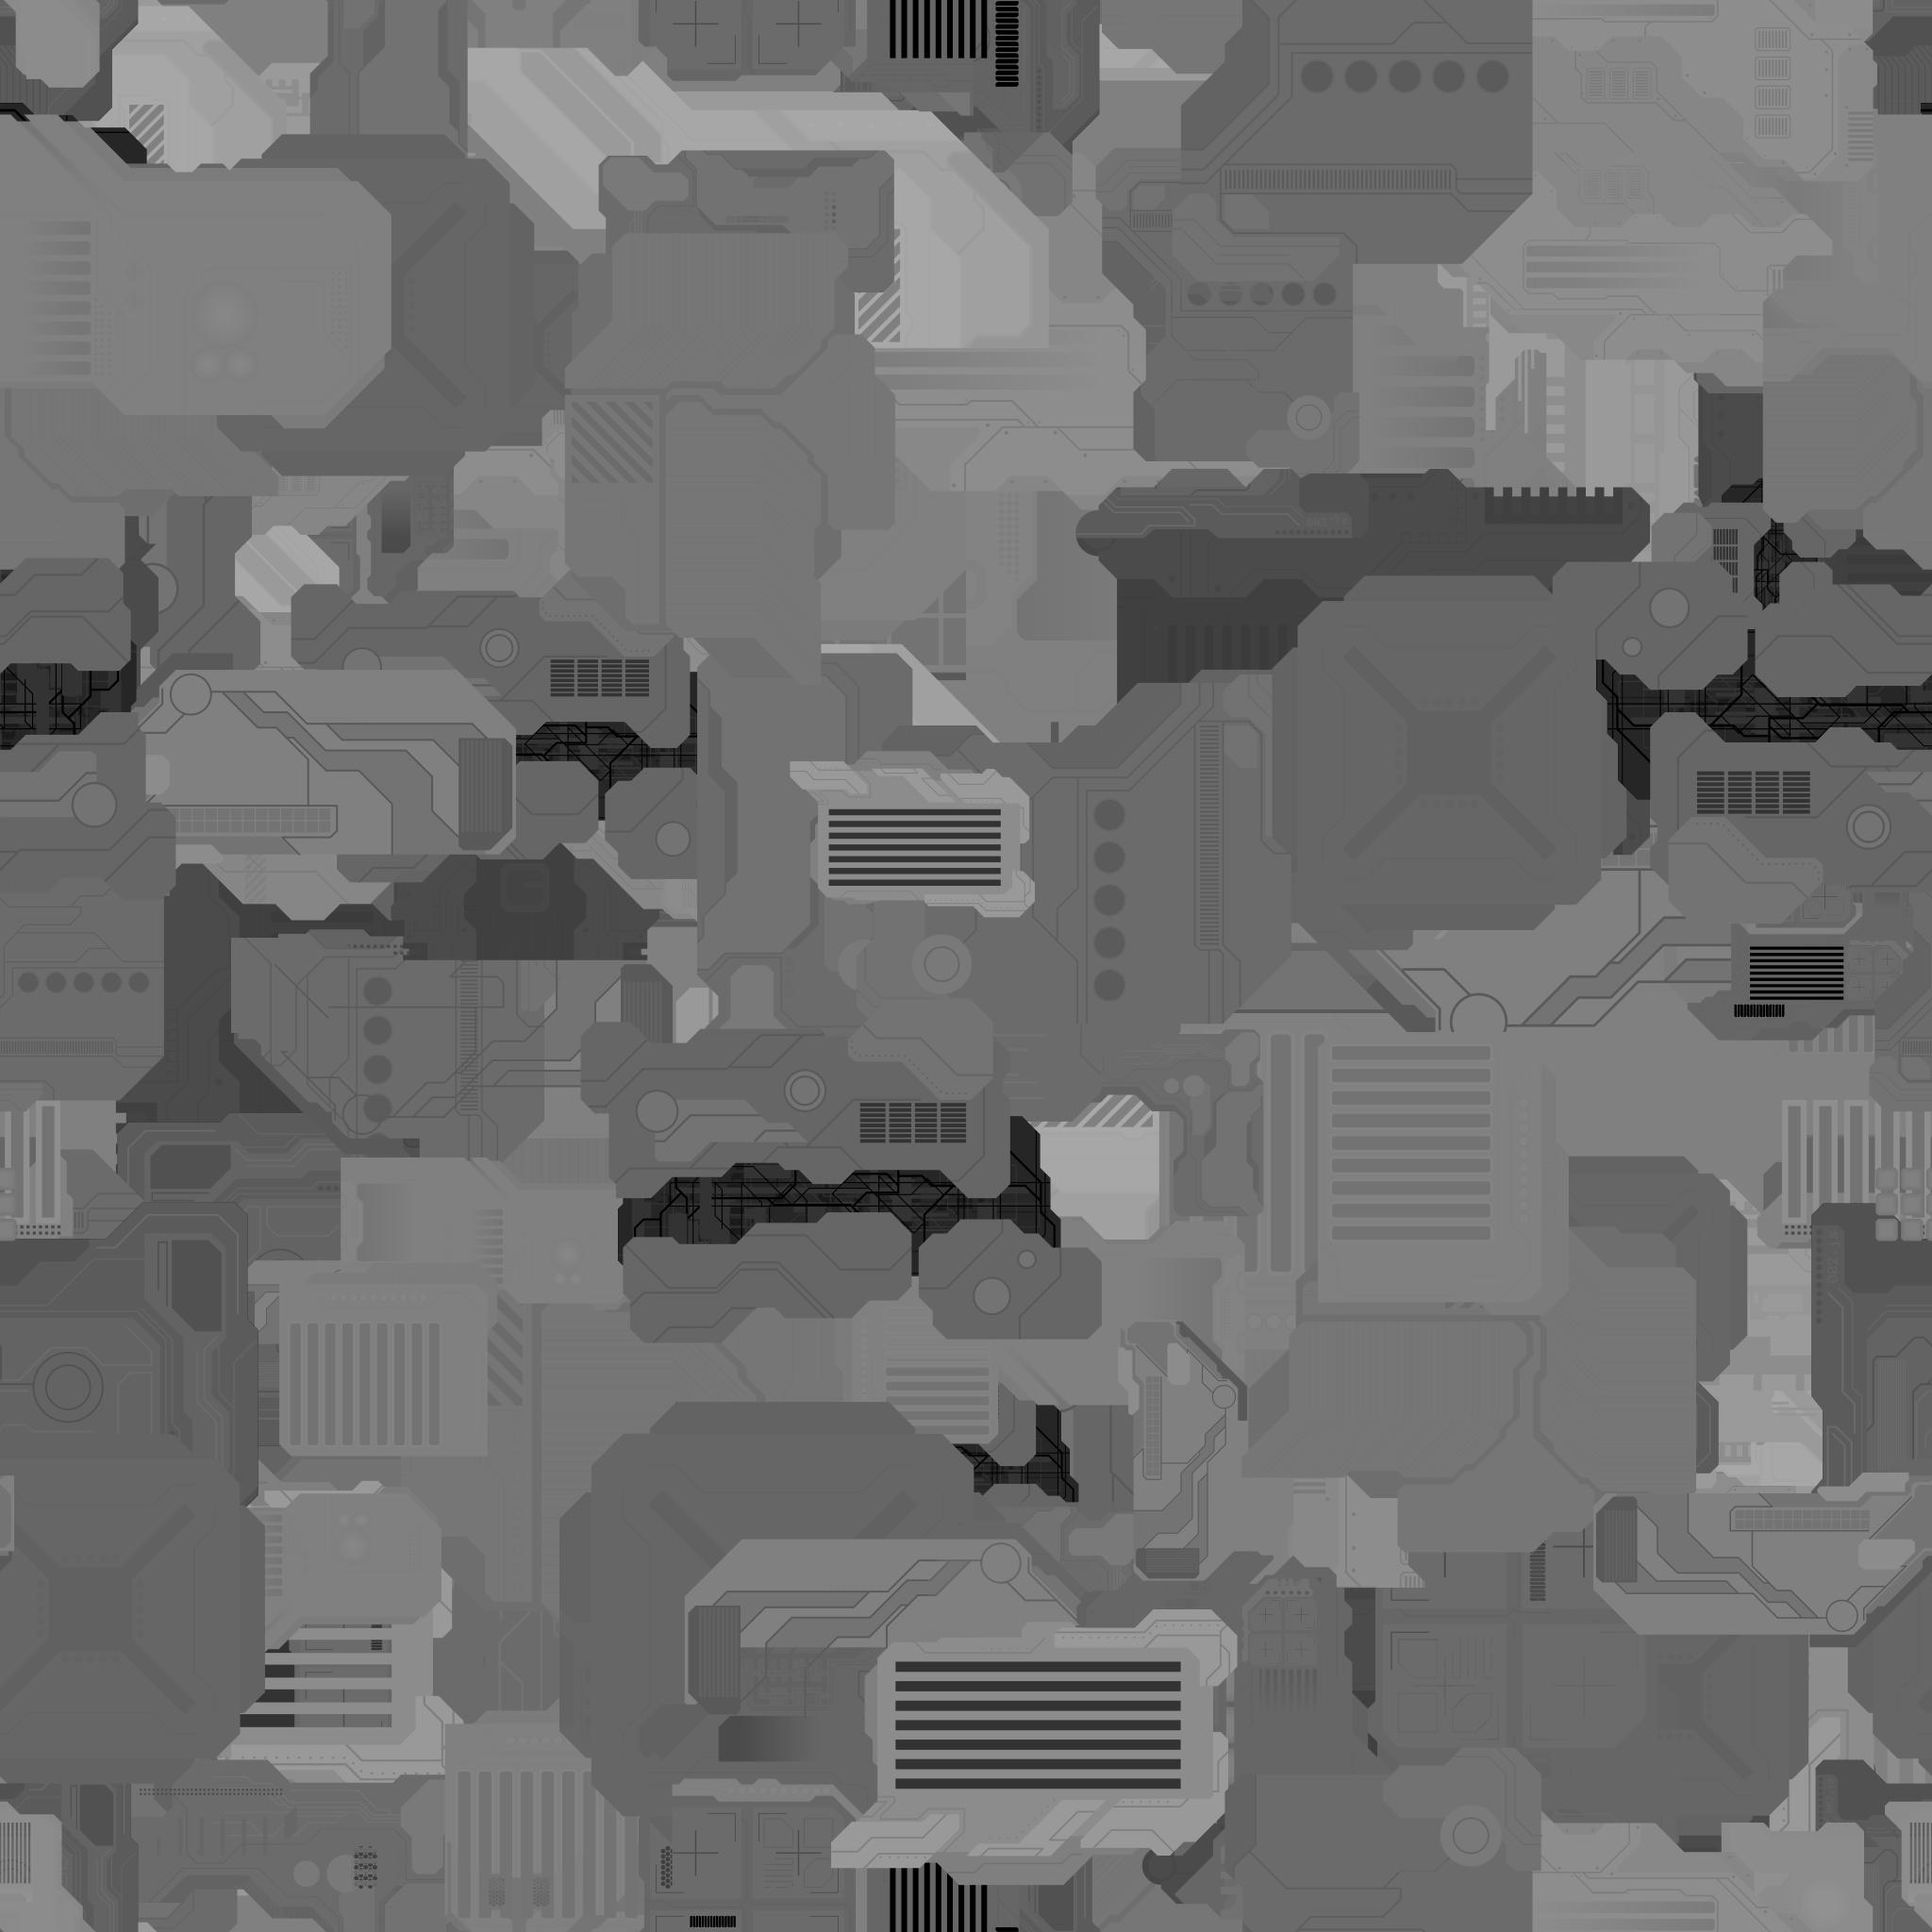 8k rendering - 8k x 8k Landscapes in Project Dogwaffle